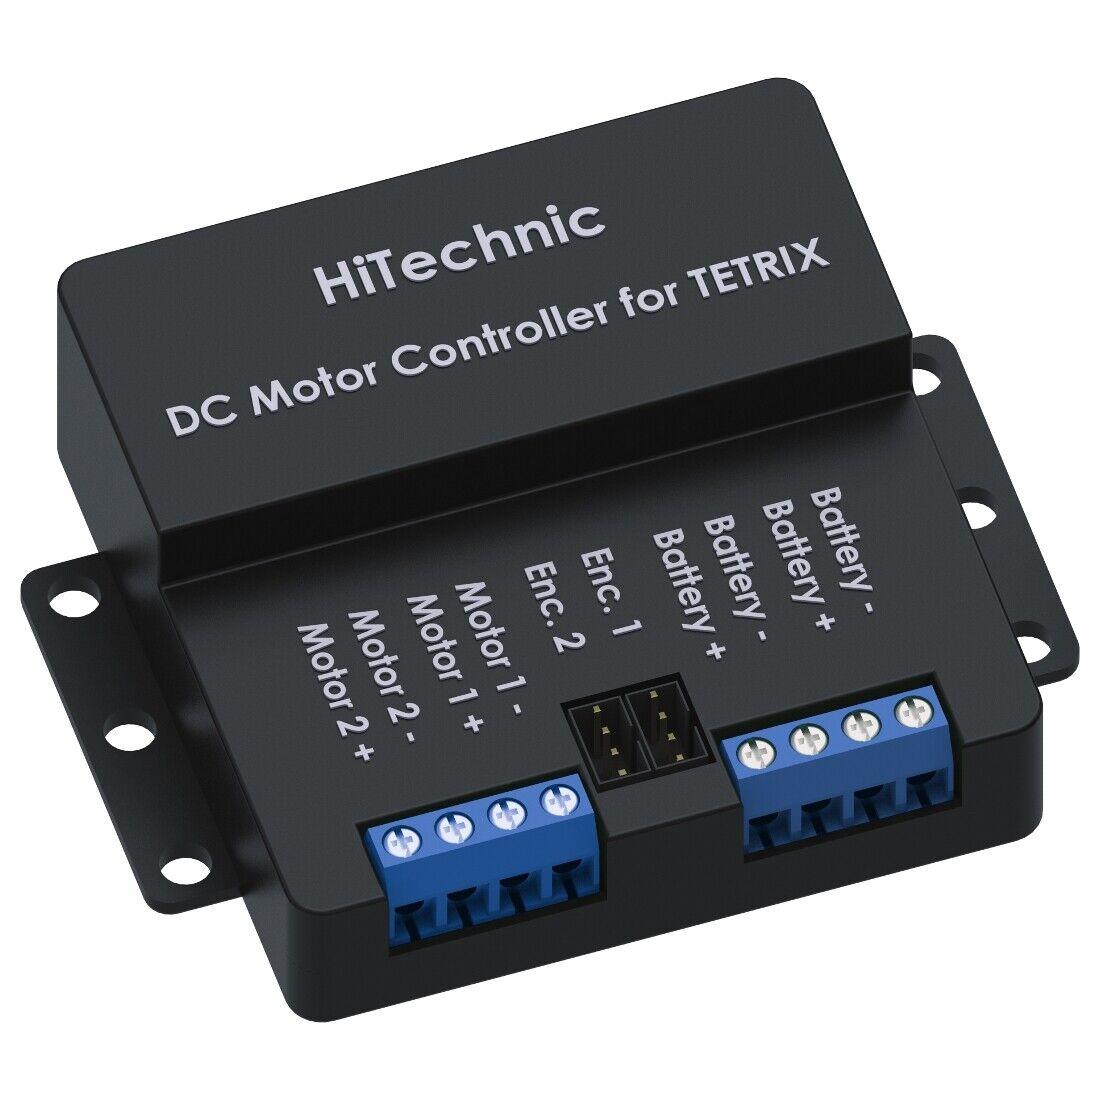 HiTechnic Servo Controller for TETRIX Lego EV3 Robot 34303